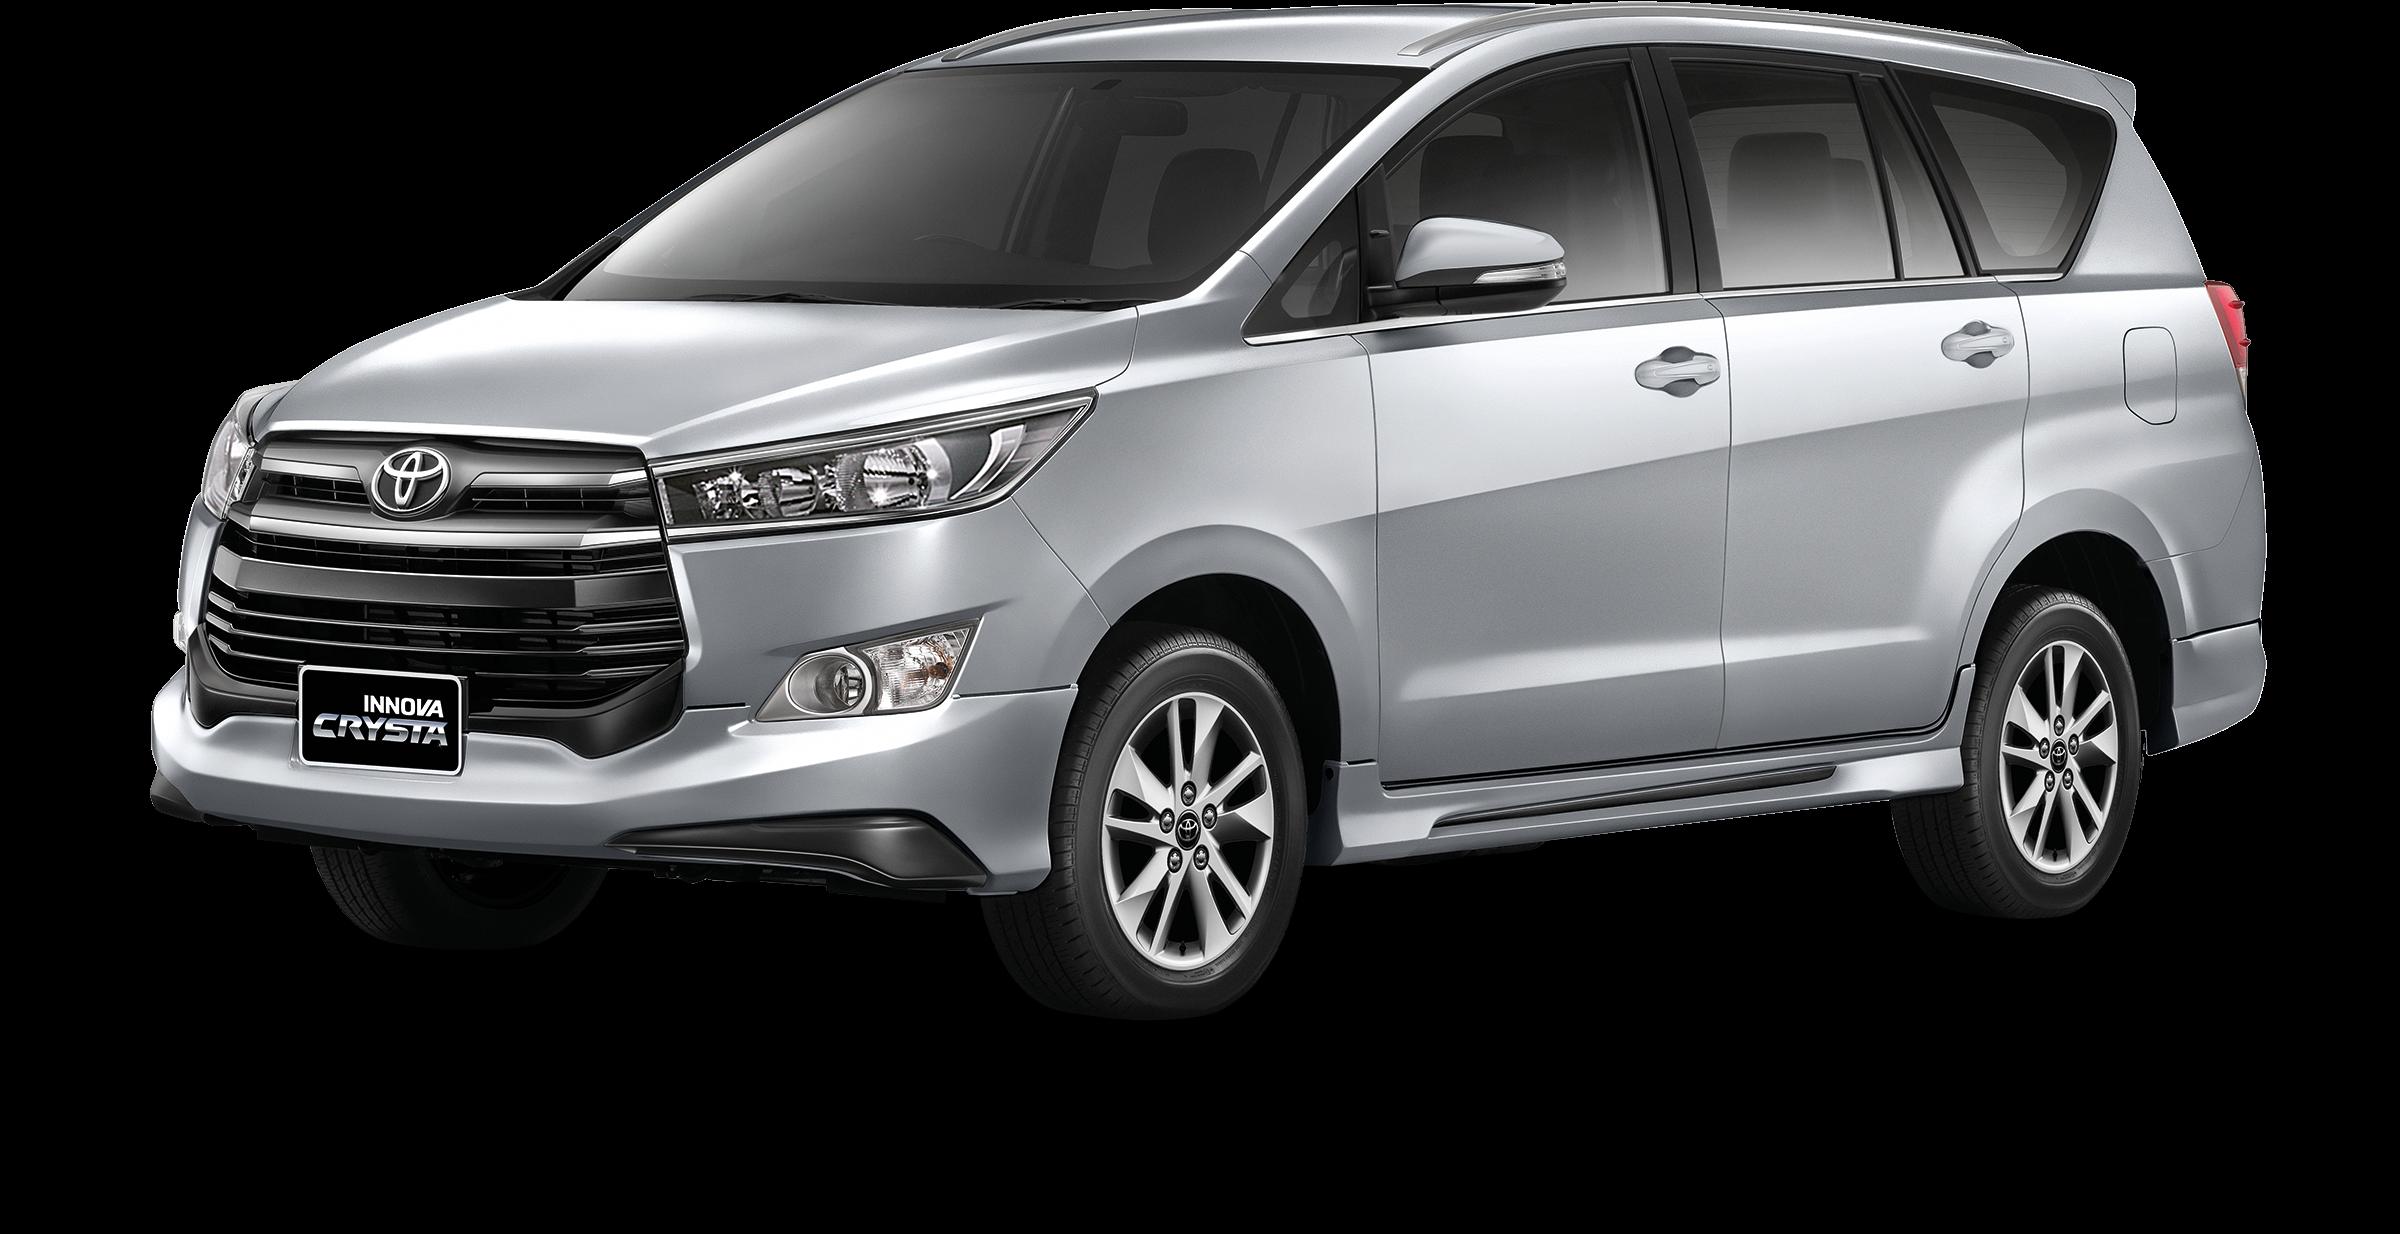 Toyota, Car, Toyota Innova Crysta, Motor Vehicle Png - Innova Crysta G Plus (2399x1333), Png Download